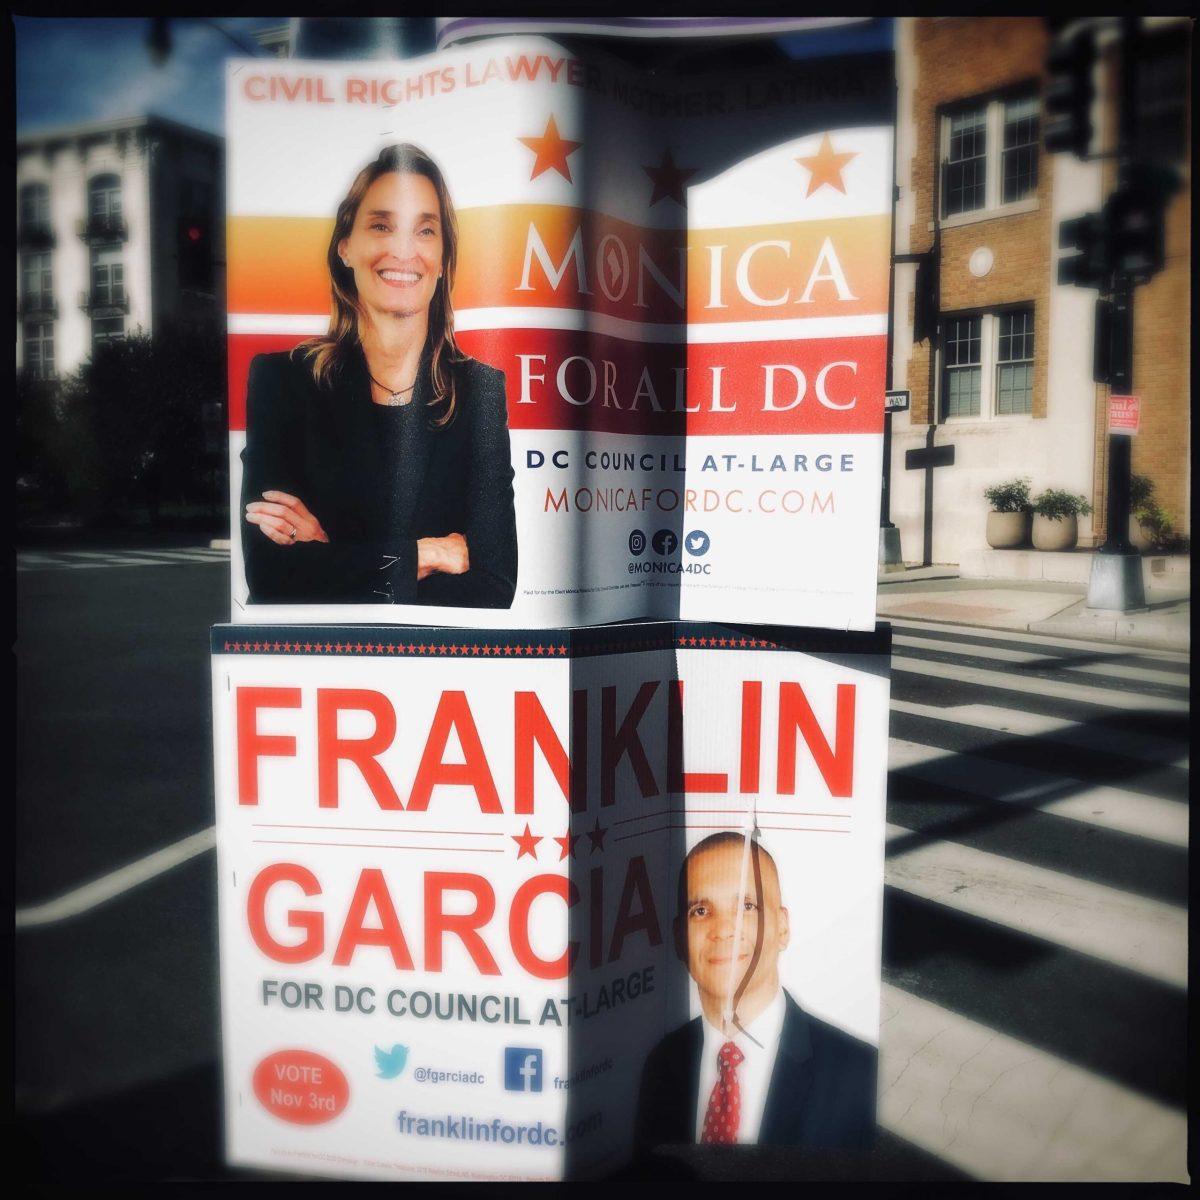 Campaign signs for Monica Palacio and Franklin Garcia